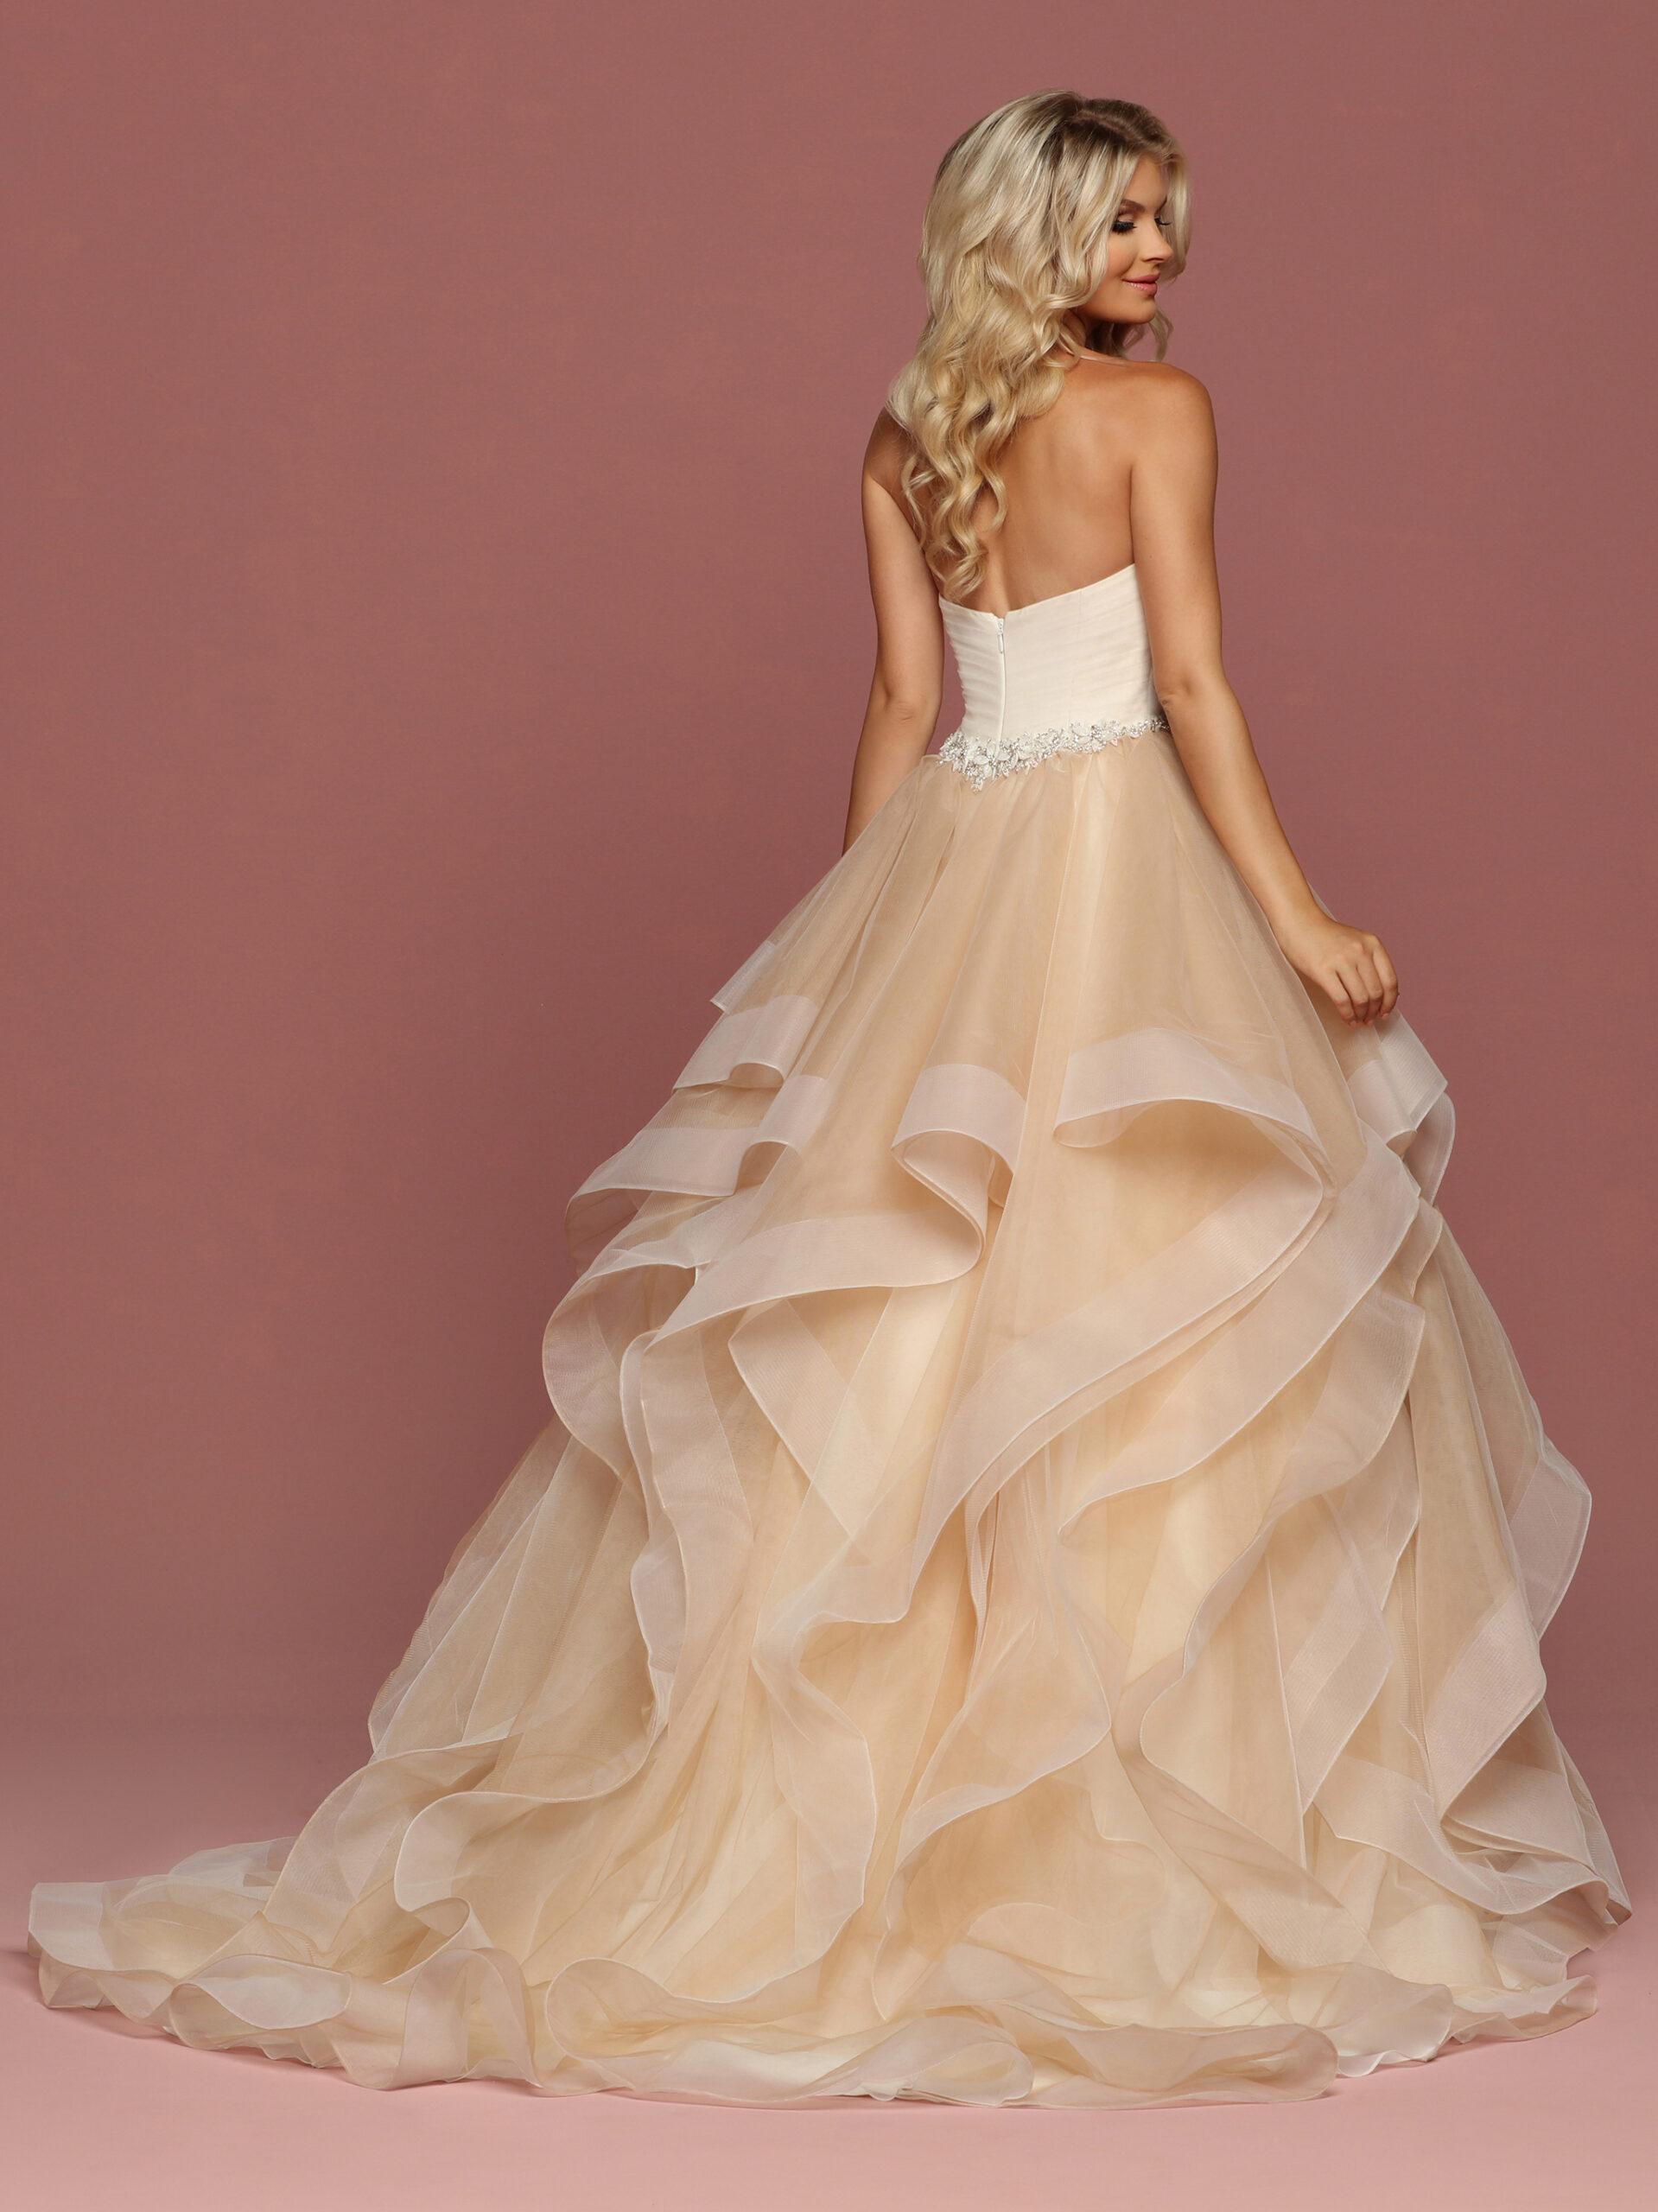 davinci-bridal-gown-10-scaled.jpg